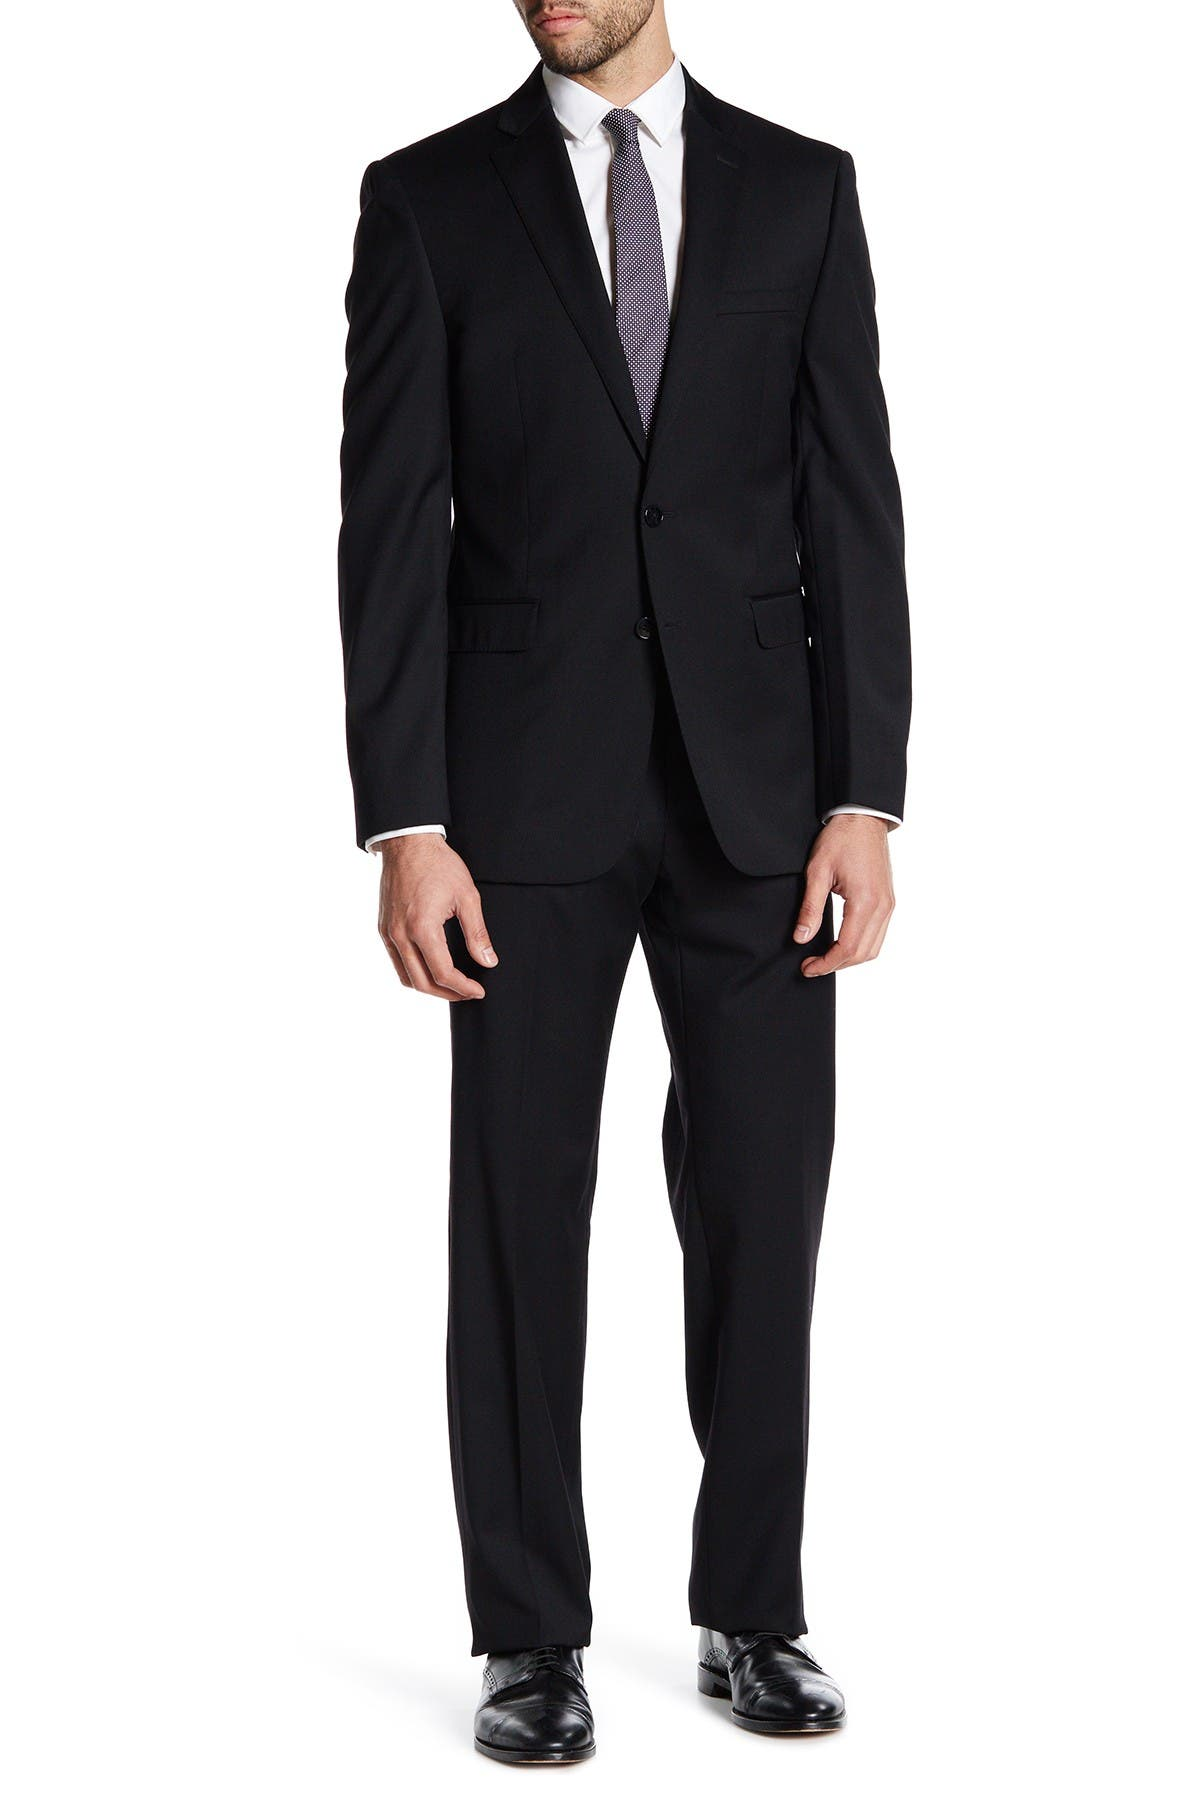 Image of Calvin Klein Black Sharkskin Two Button Notch Lapel Wool Suit